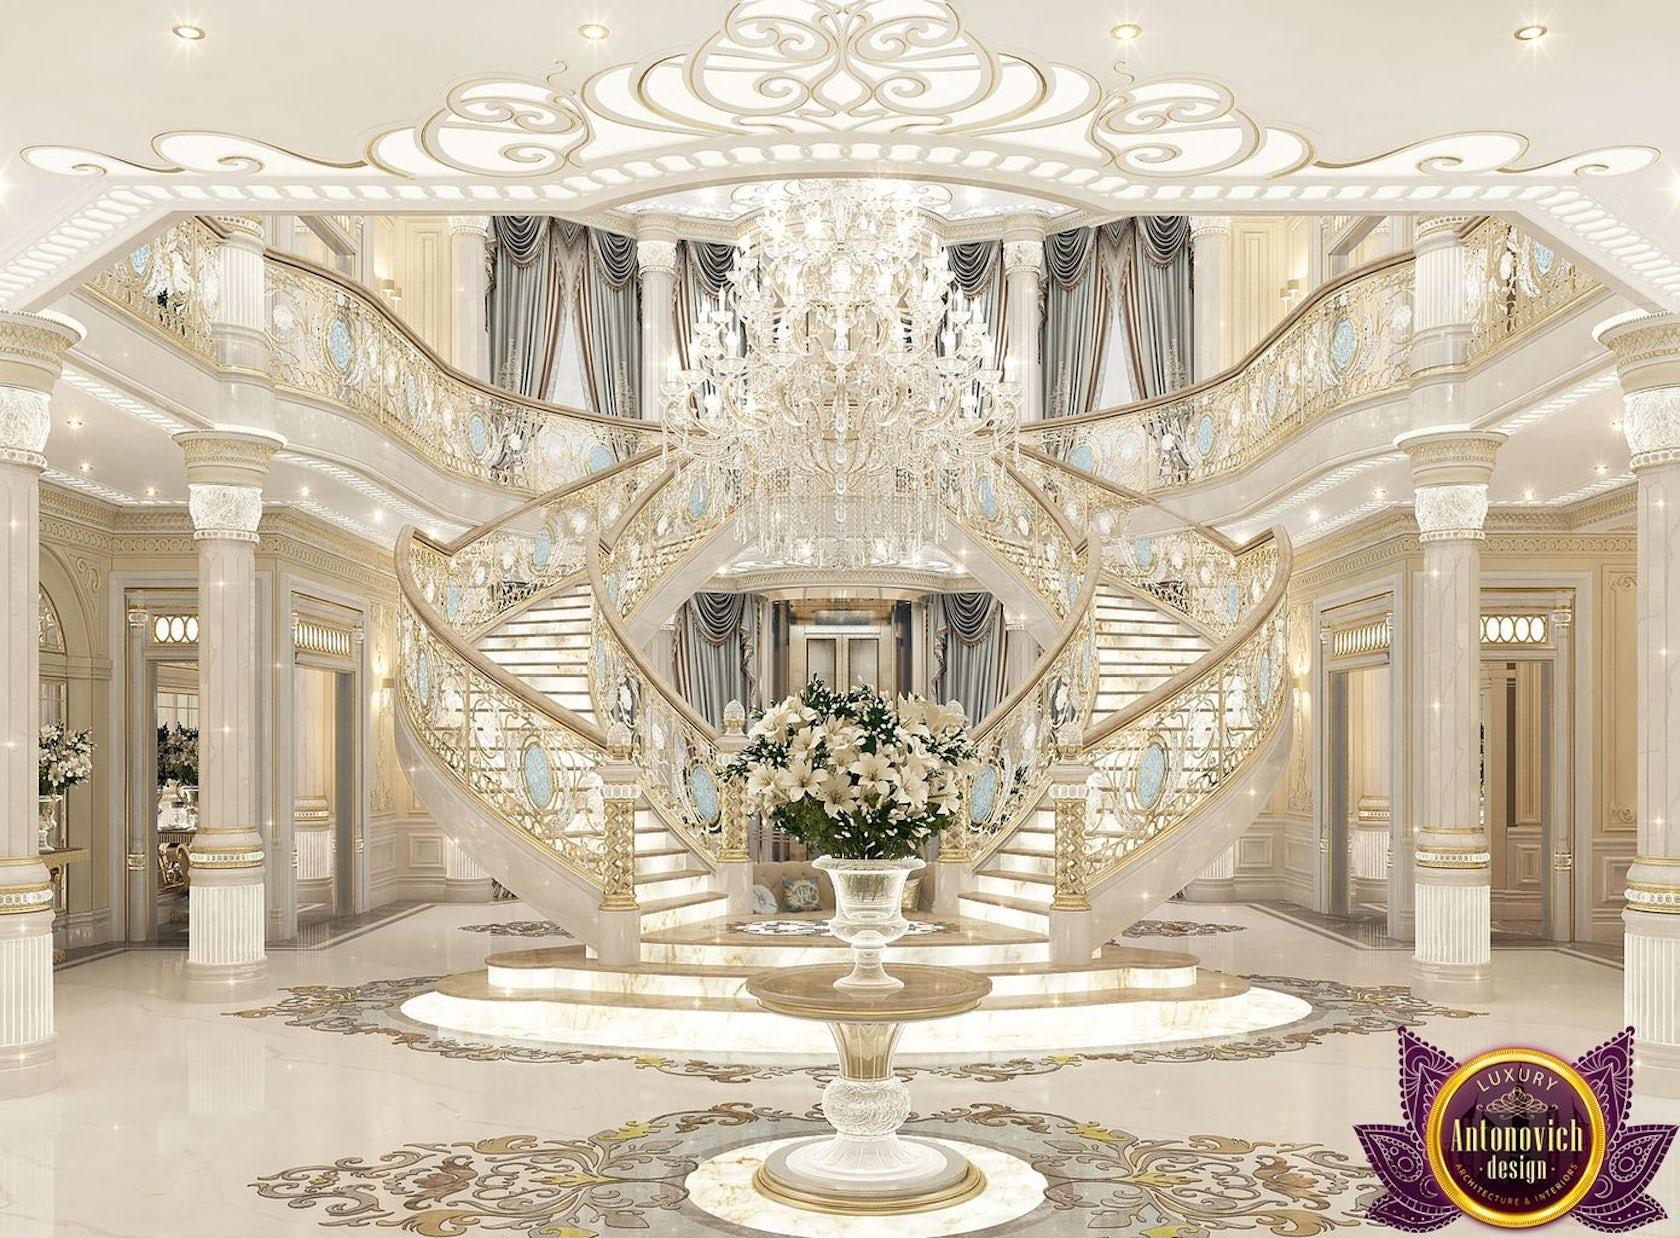 Kitchen Design Usa By Katrina Antonovich: Palace Interiors From Luxury Antonovich Design